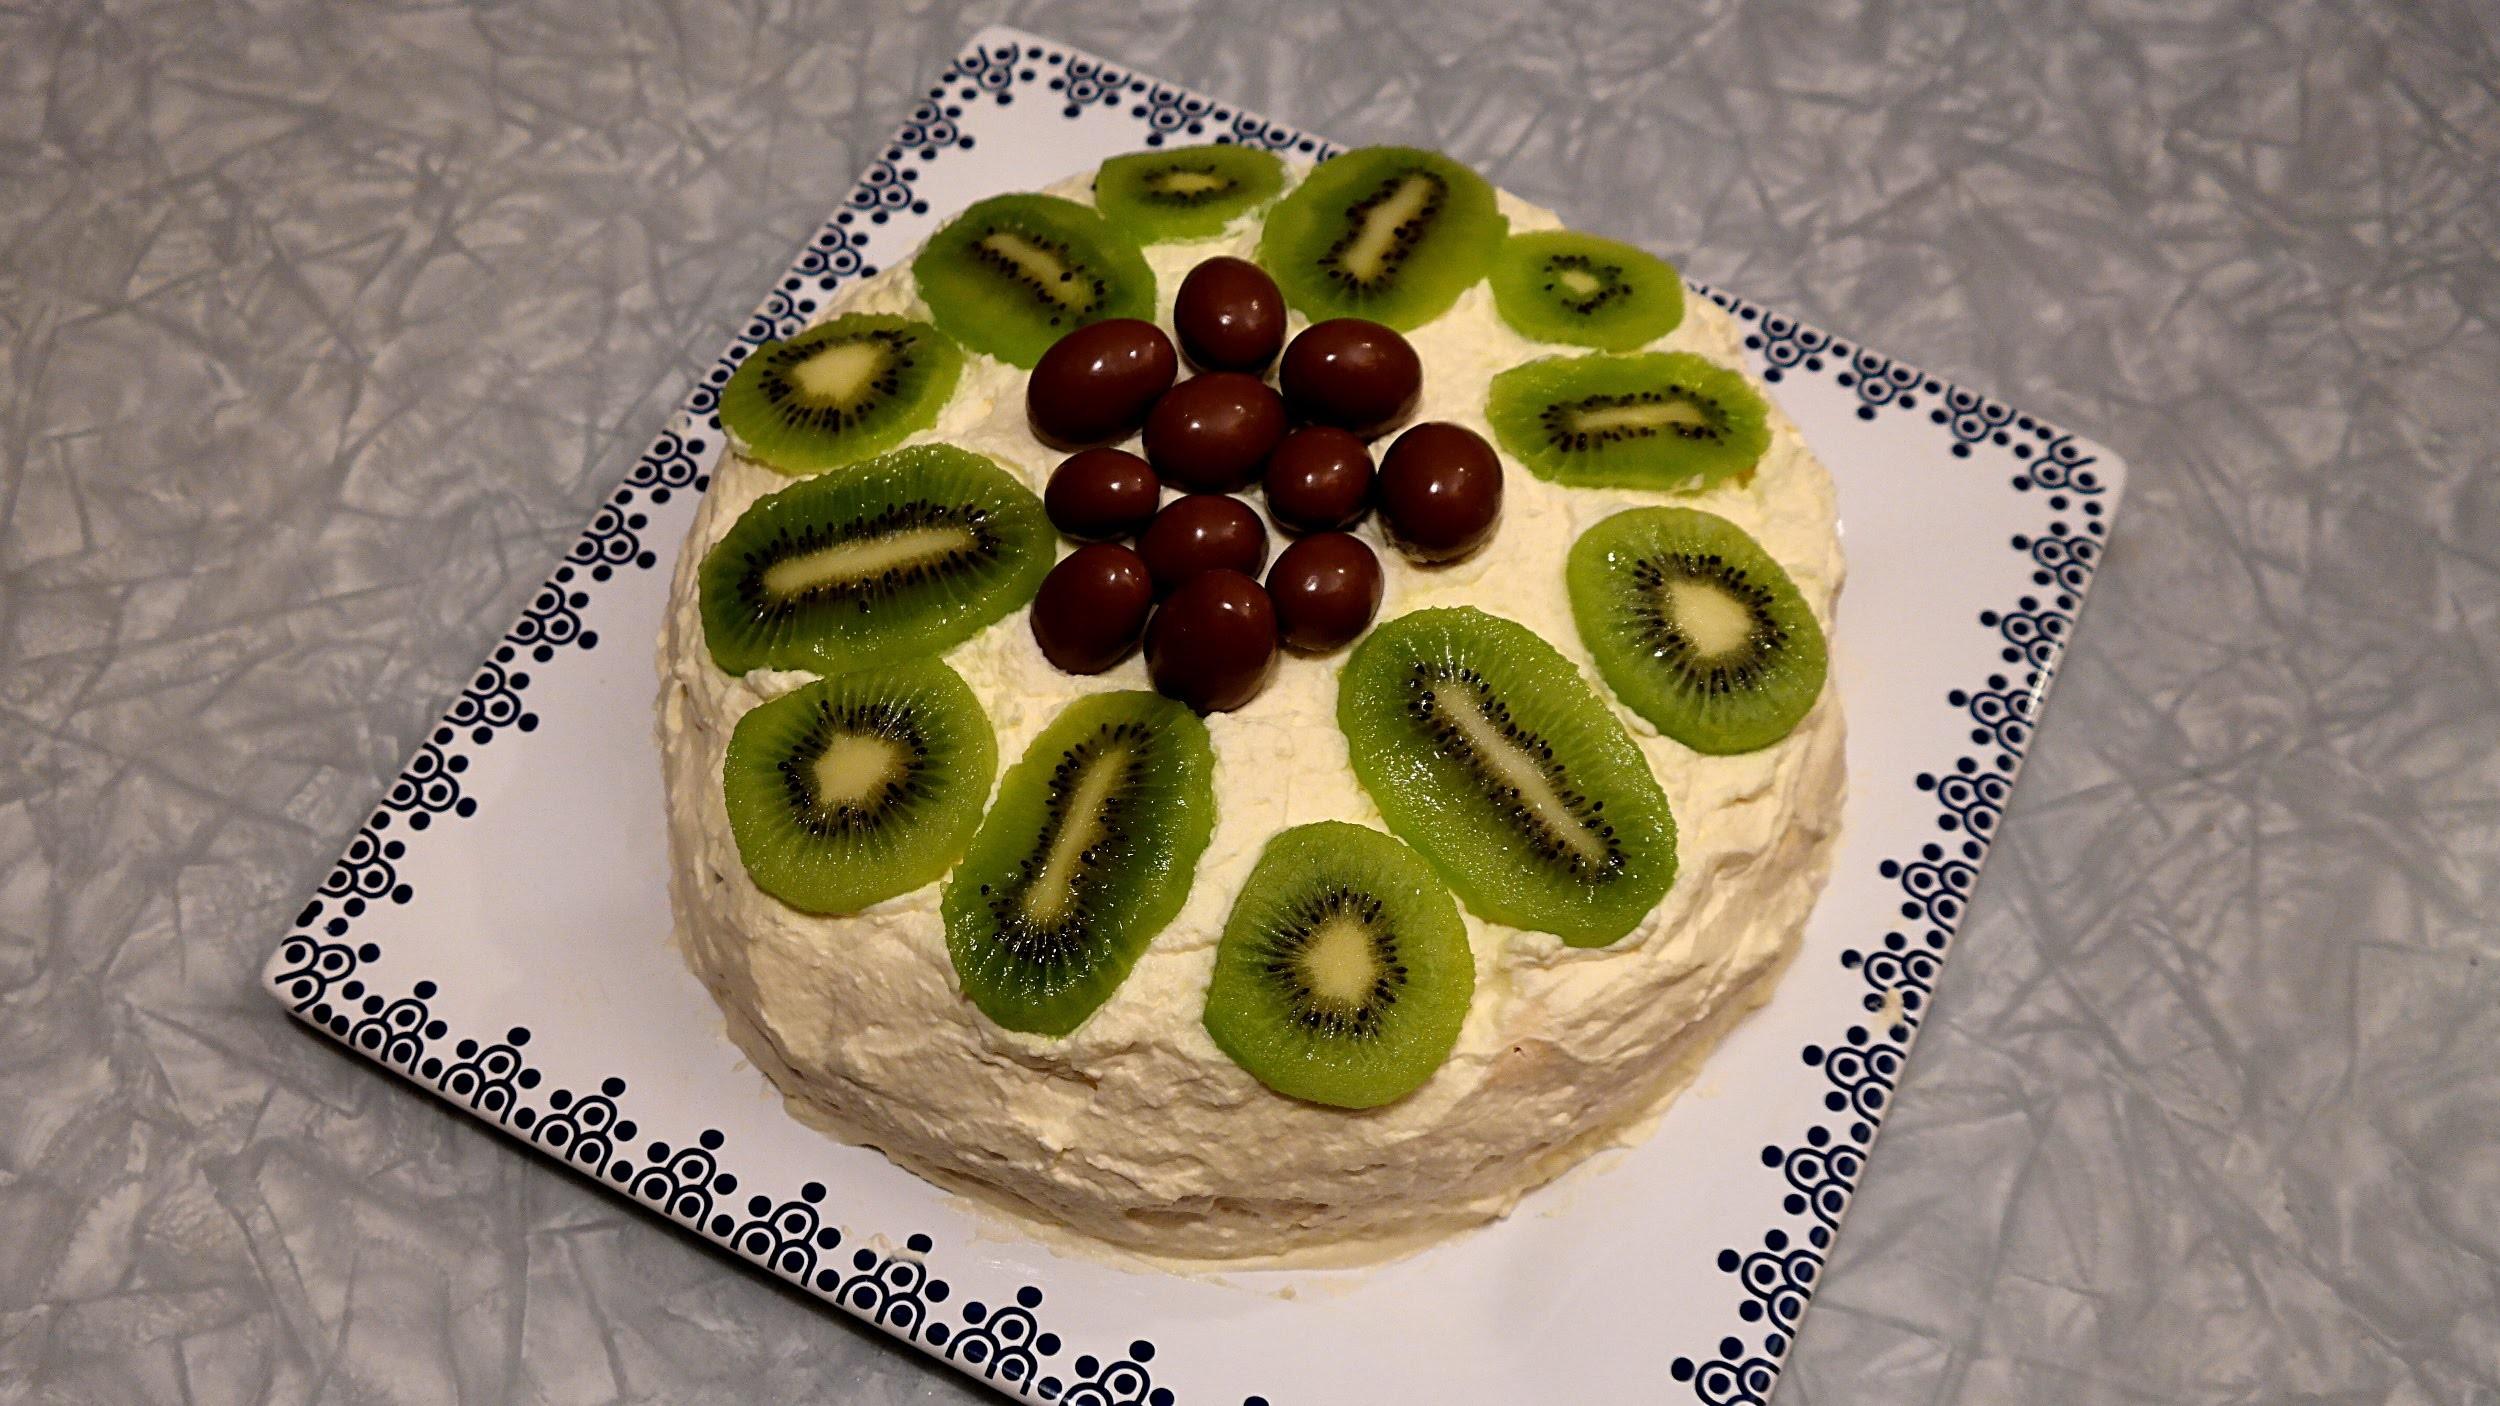 How to bake a Pavlova - Original Kiwi Cake - Backvideo aus Neuseeland